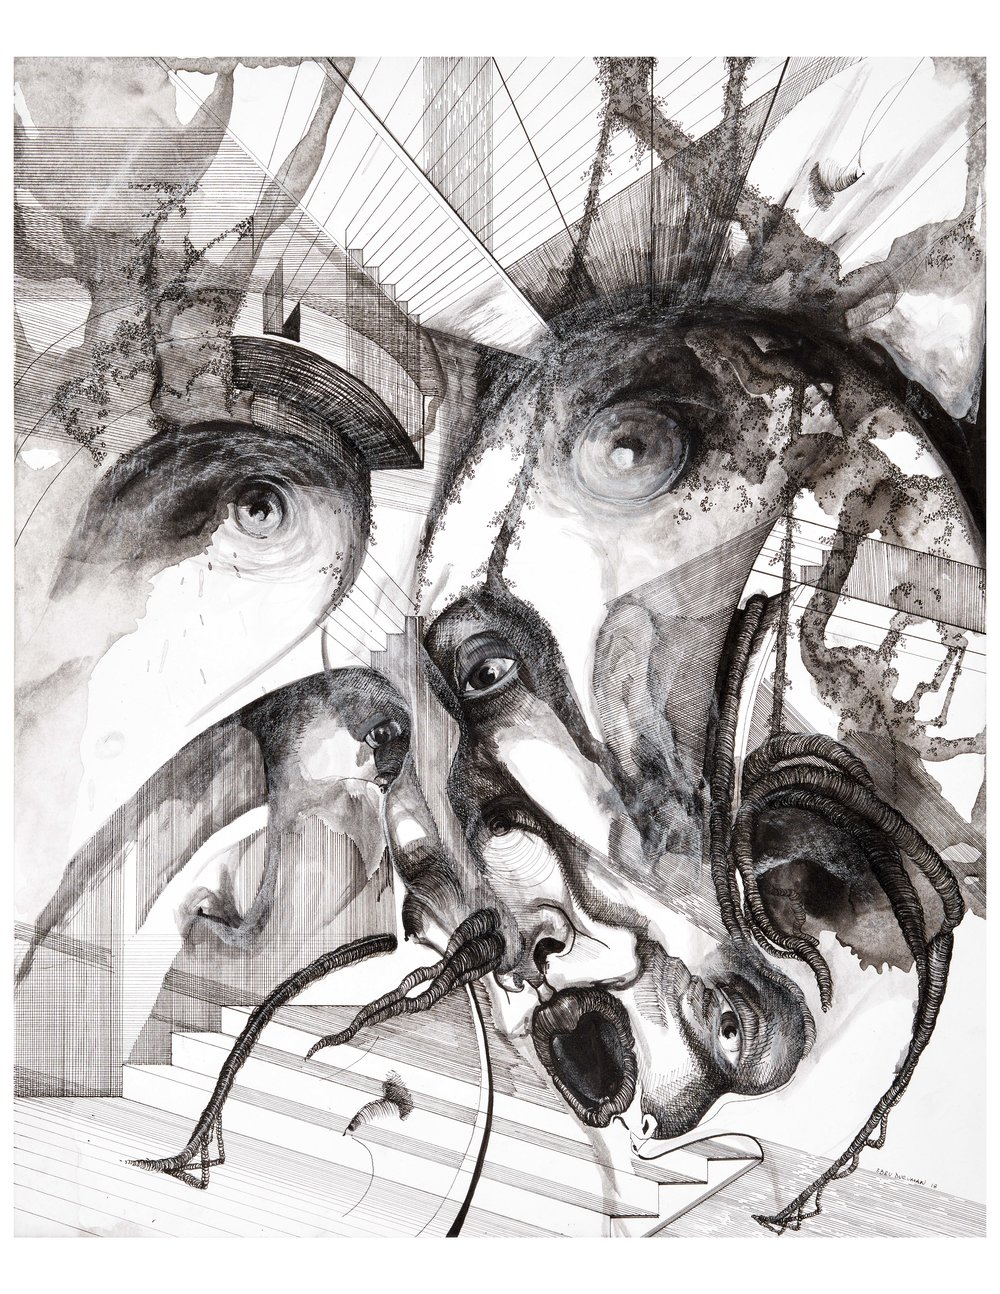 EbruDuruman-BreathingFaces-14_x17_-PenInk on Paper-2017-500$.jpg